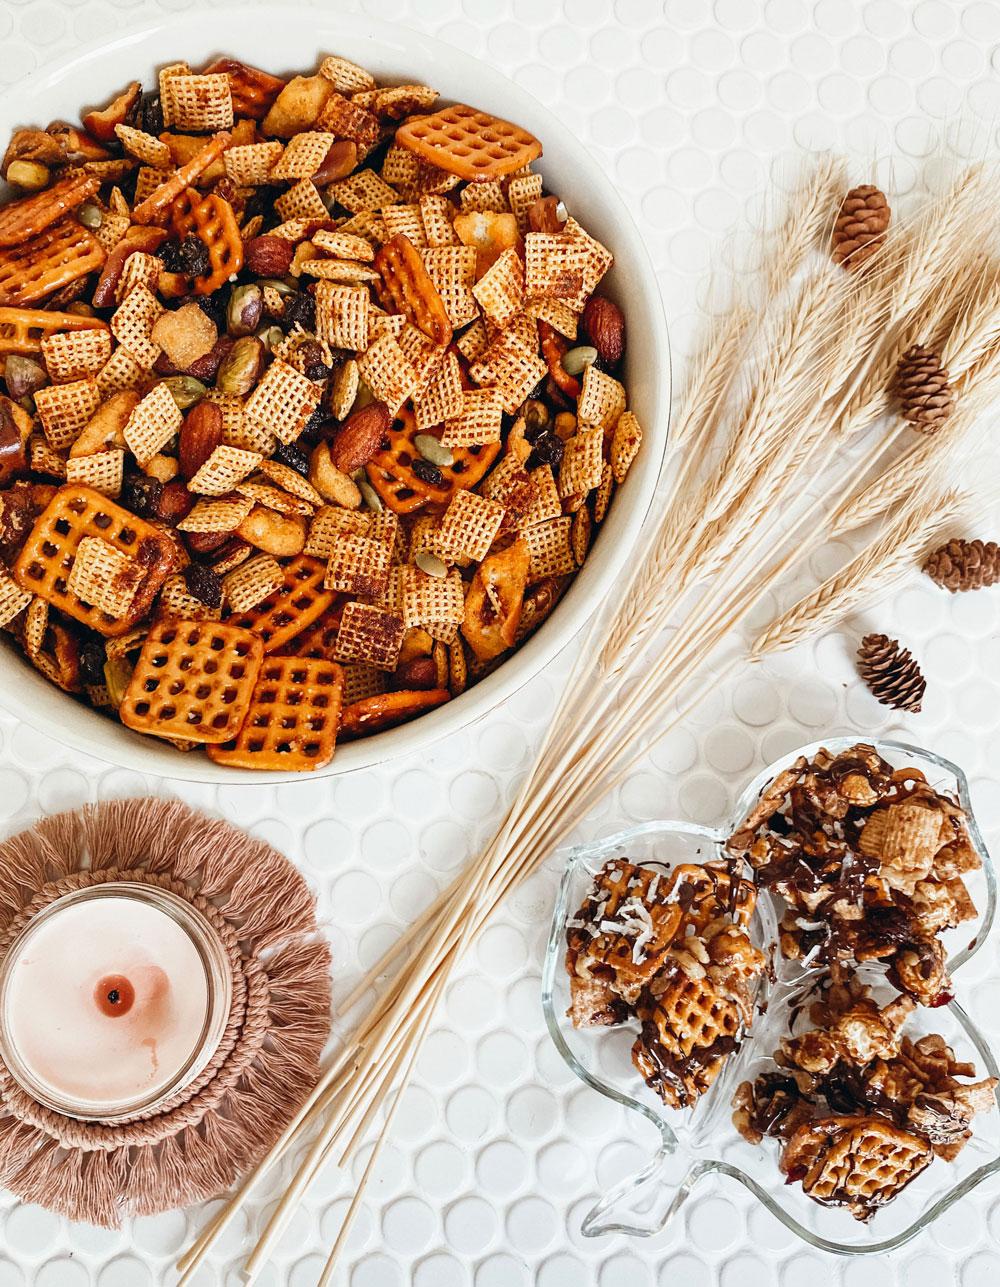 Autumn Harvest Chex Mix Two Ways: Sweet & Savory